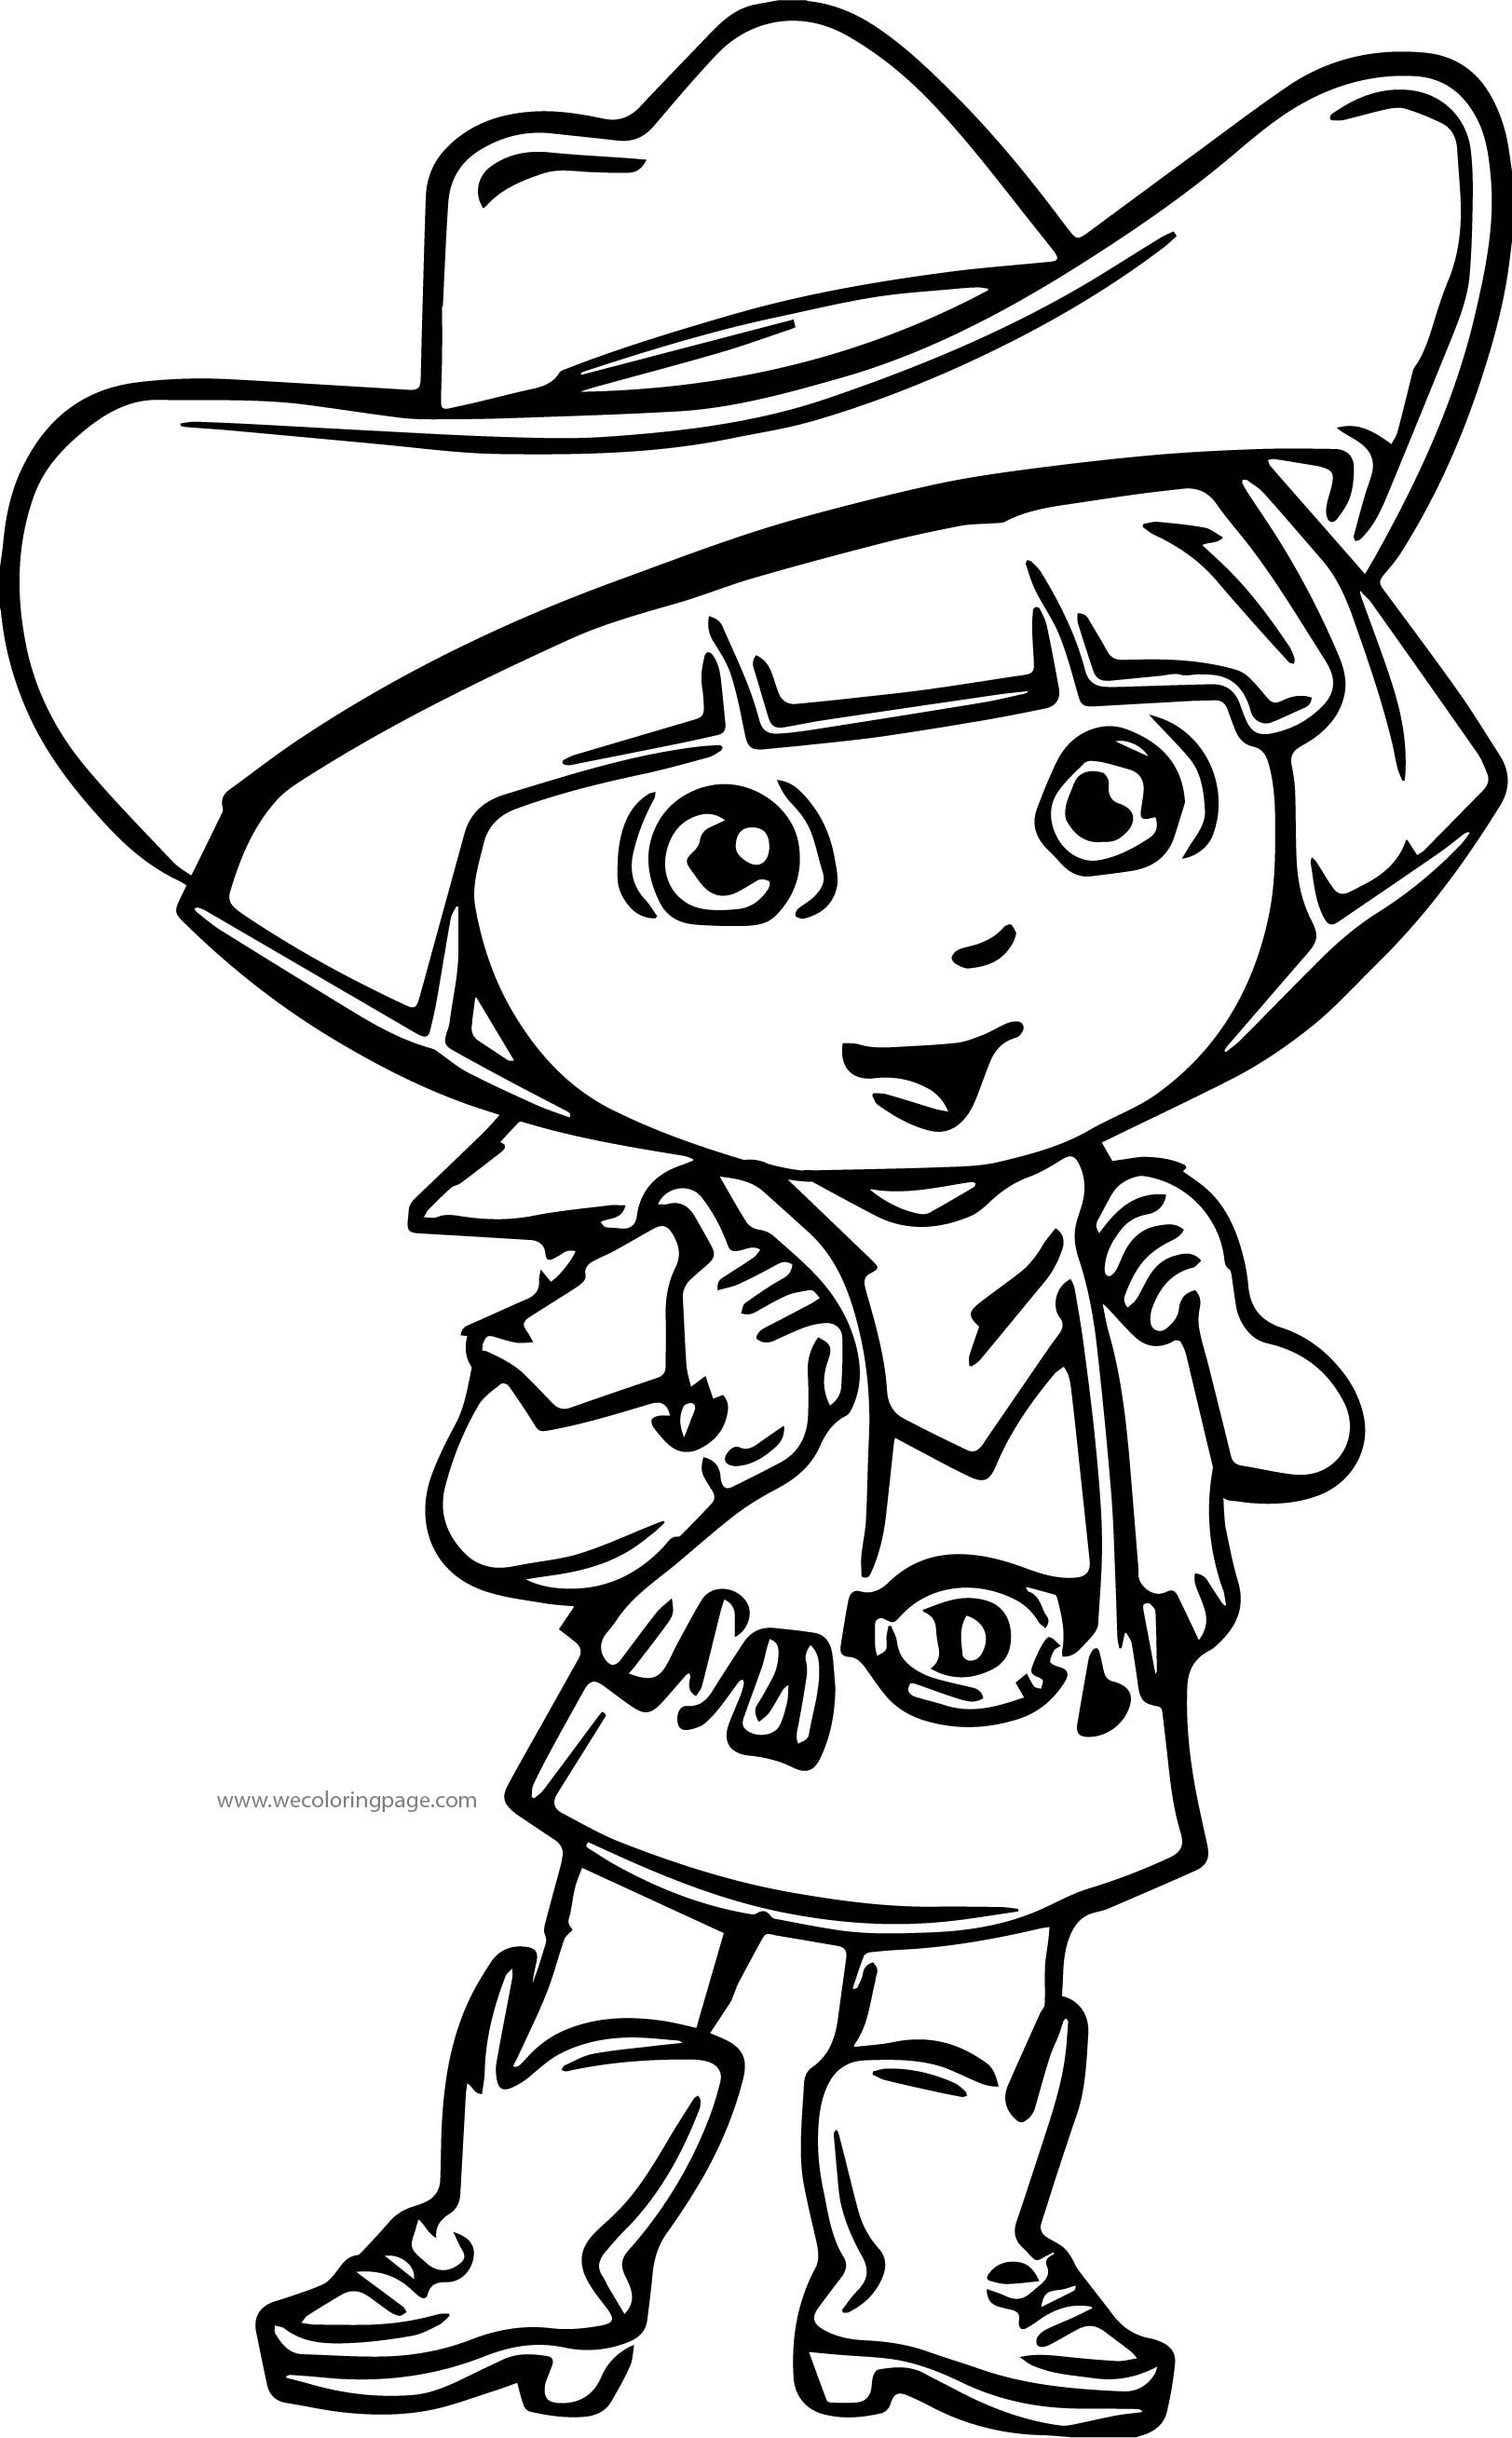 Dora The Explorer Cowboy Coloring Page Dora The Explorer Cowboy